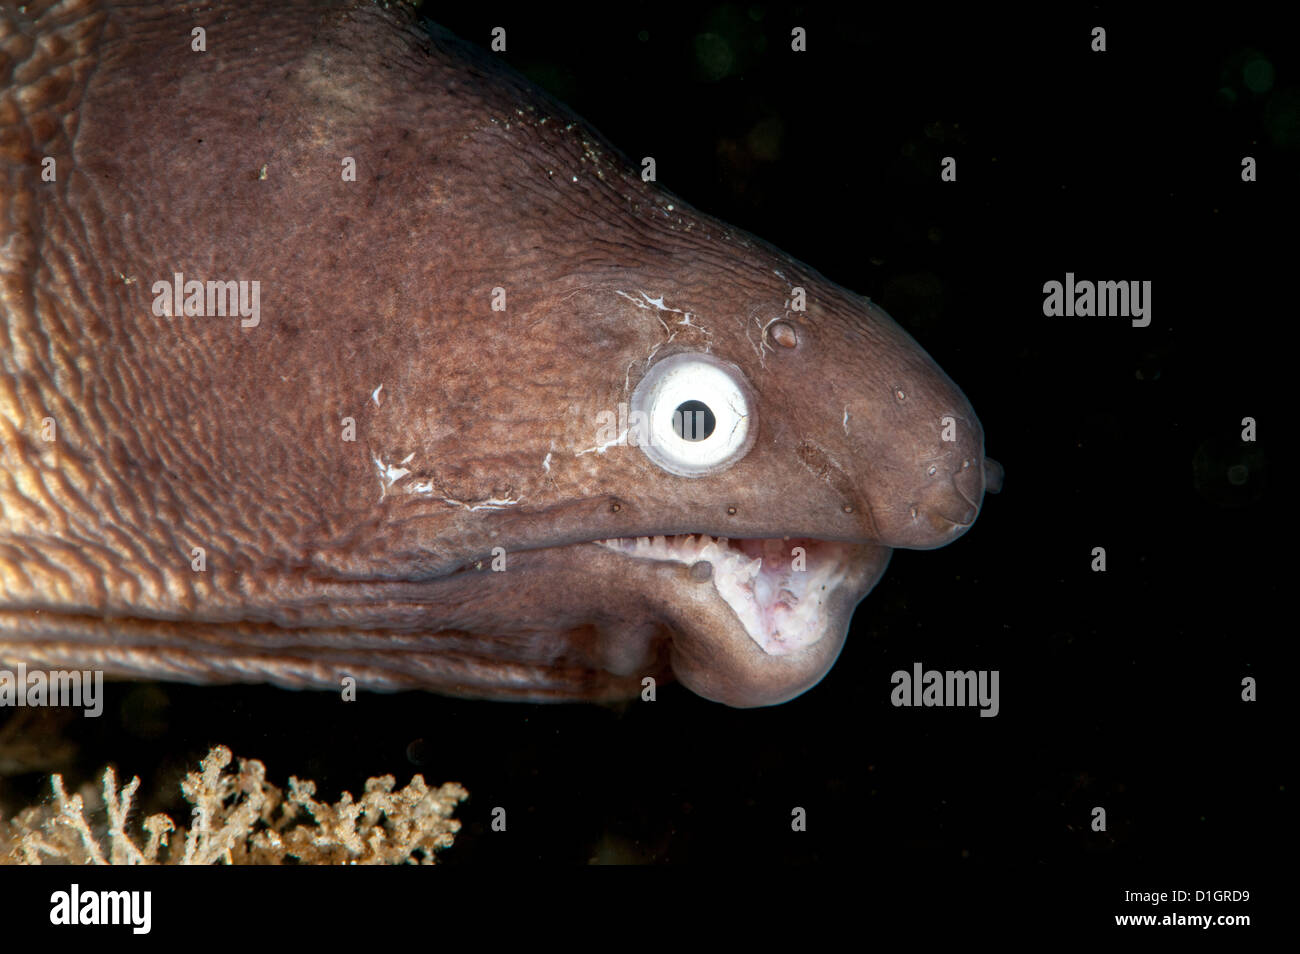 Deformed white eyed moray eel (Siderea thysoidea), Sulawesi, Indonesia, Southeast Asia, Asia - Stock Image